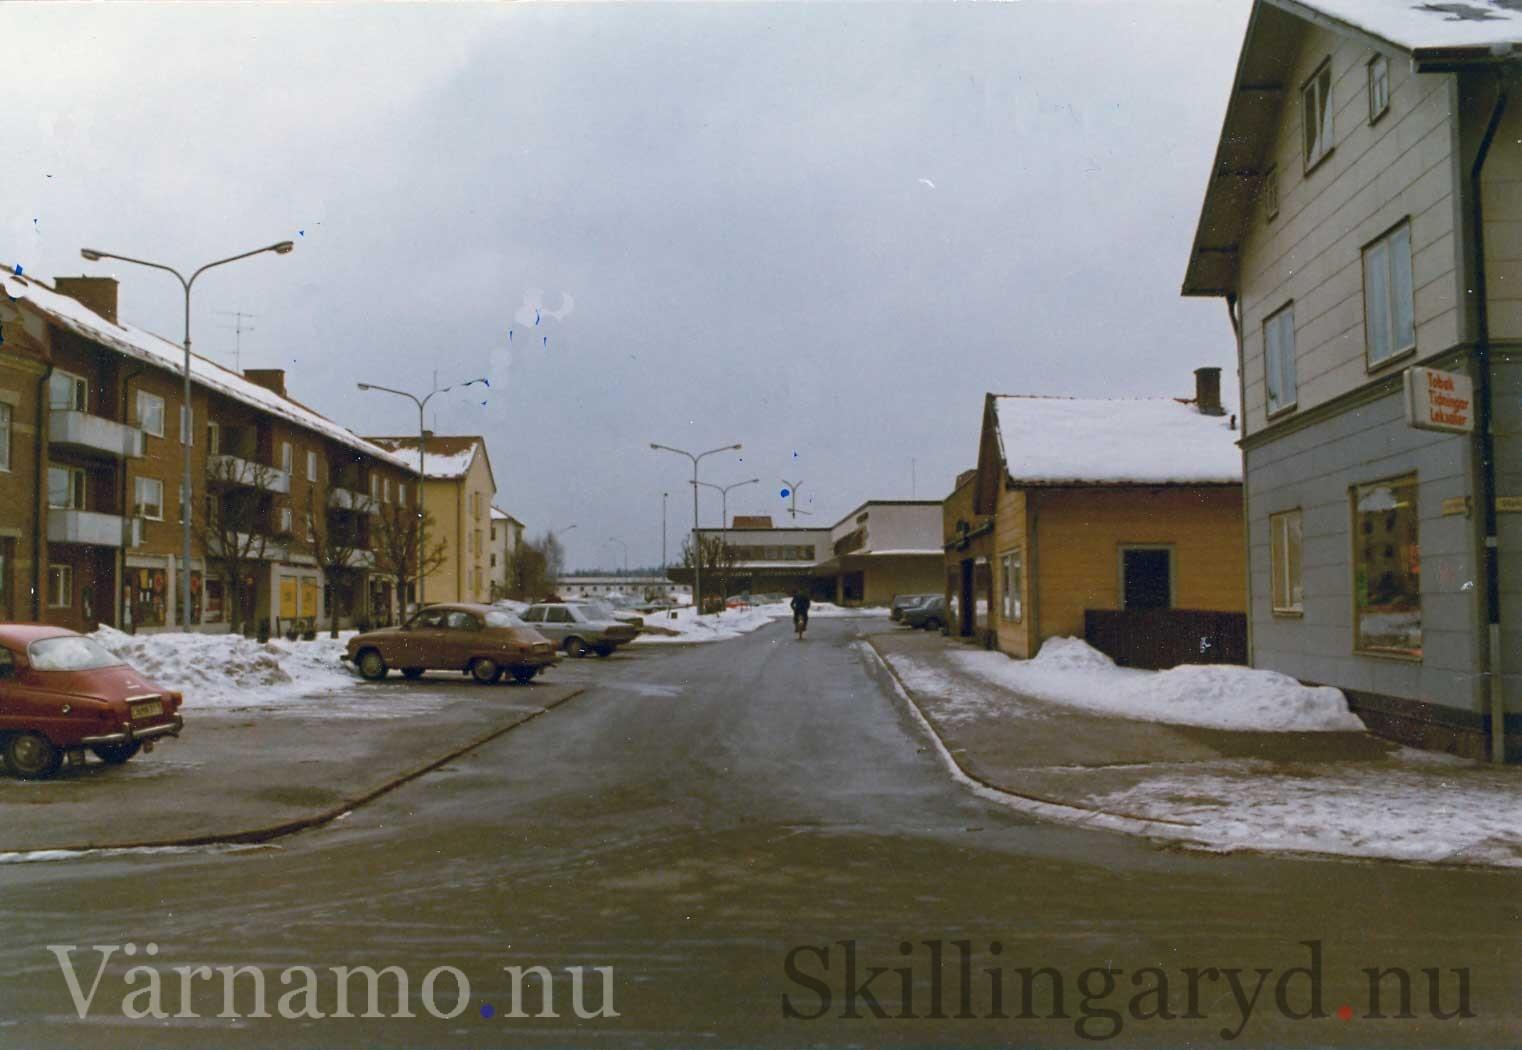 131224_torget_skillingaryd_1980_orjan